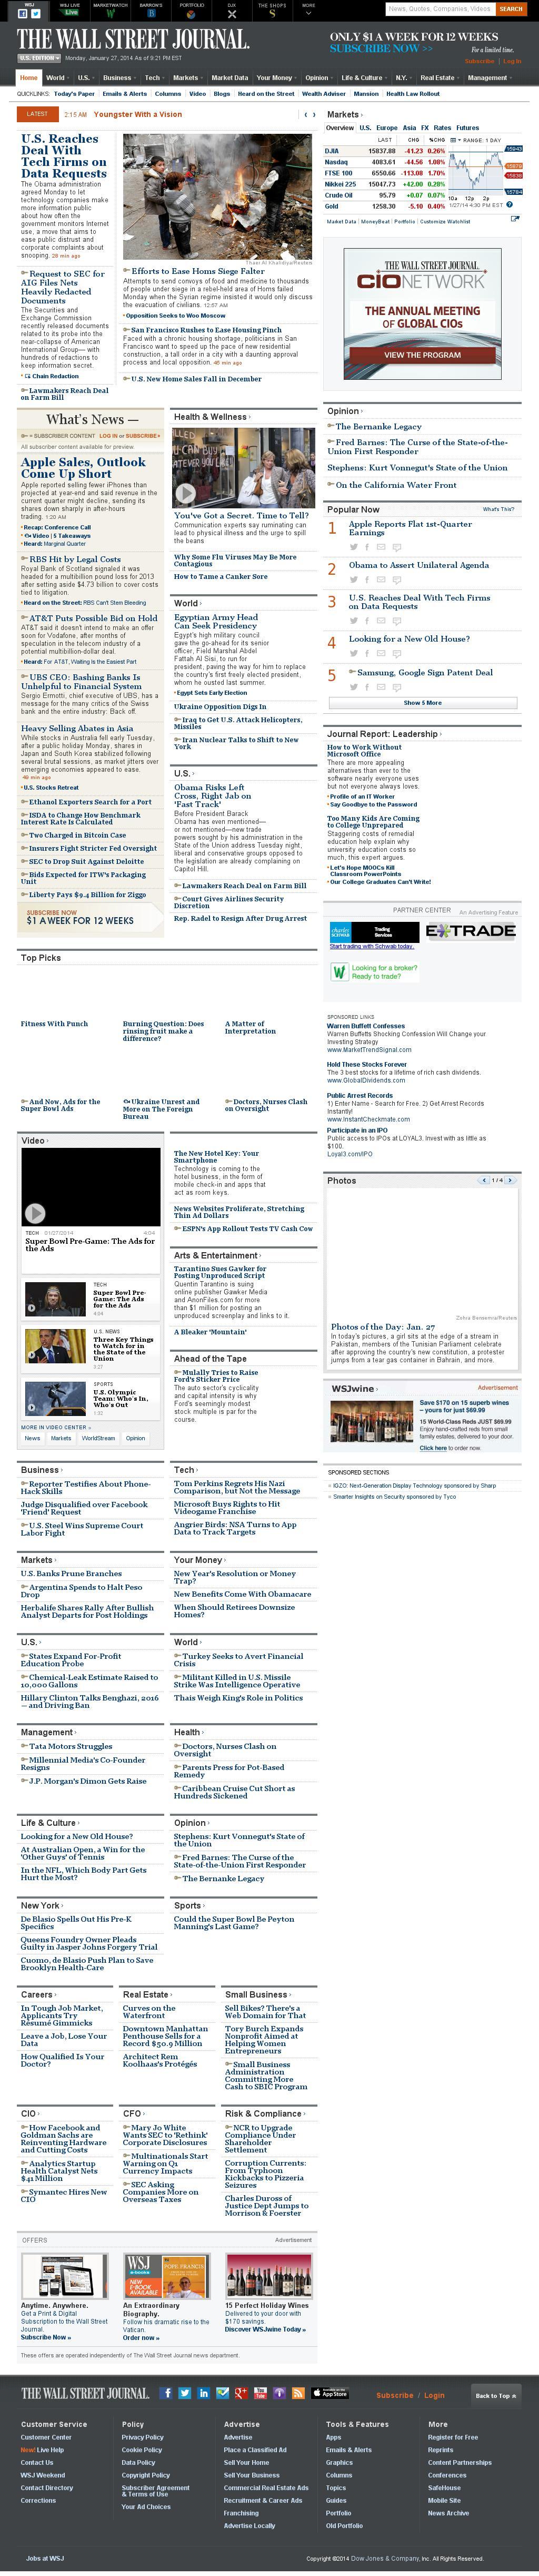 The Wall Street Journal at Tuesday Jan. 28, 2014, 2:25 a.m. UTC